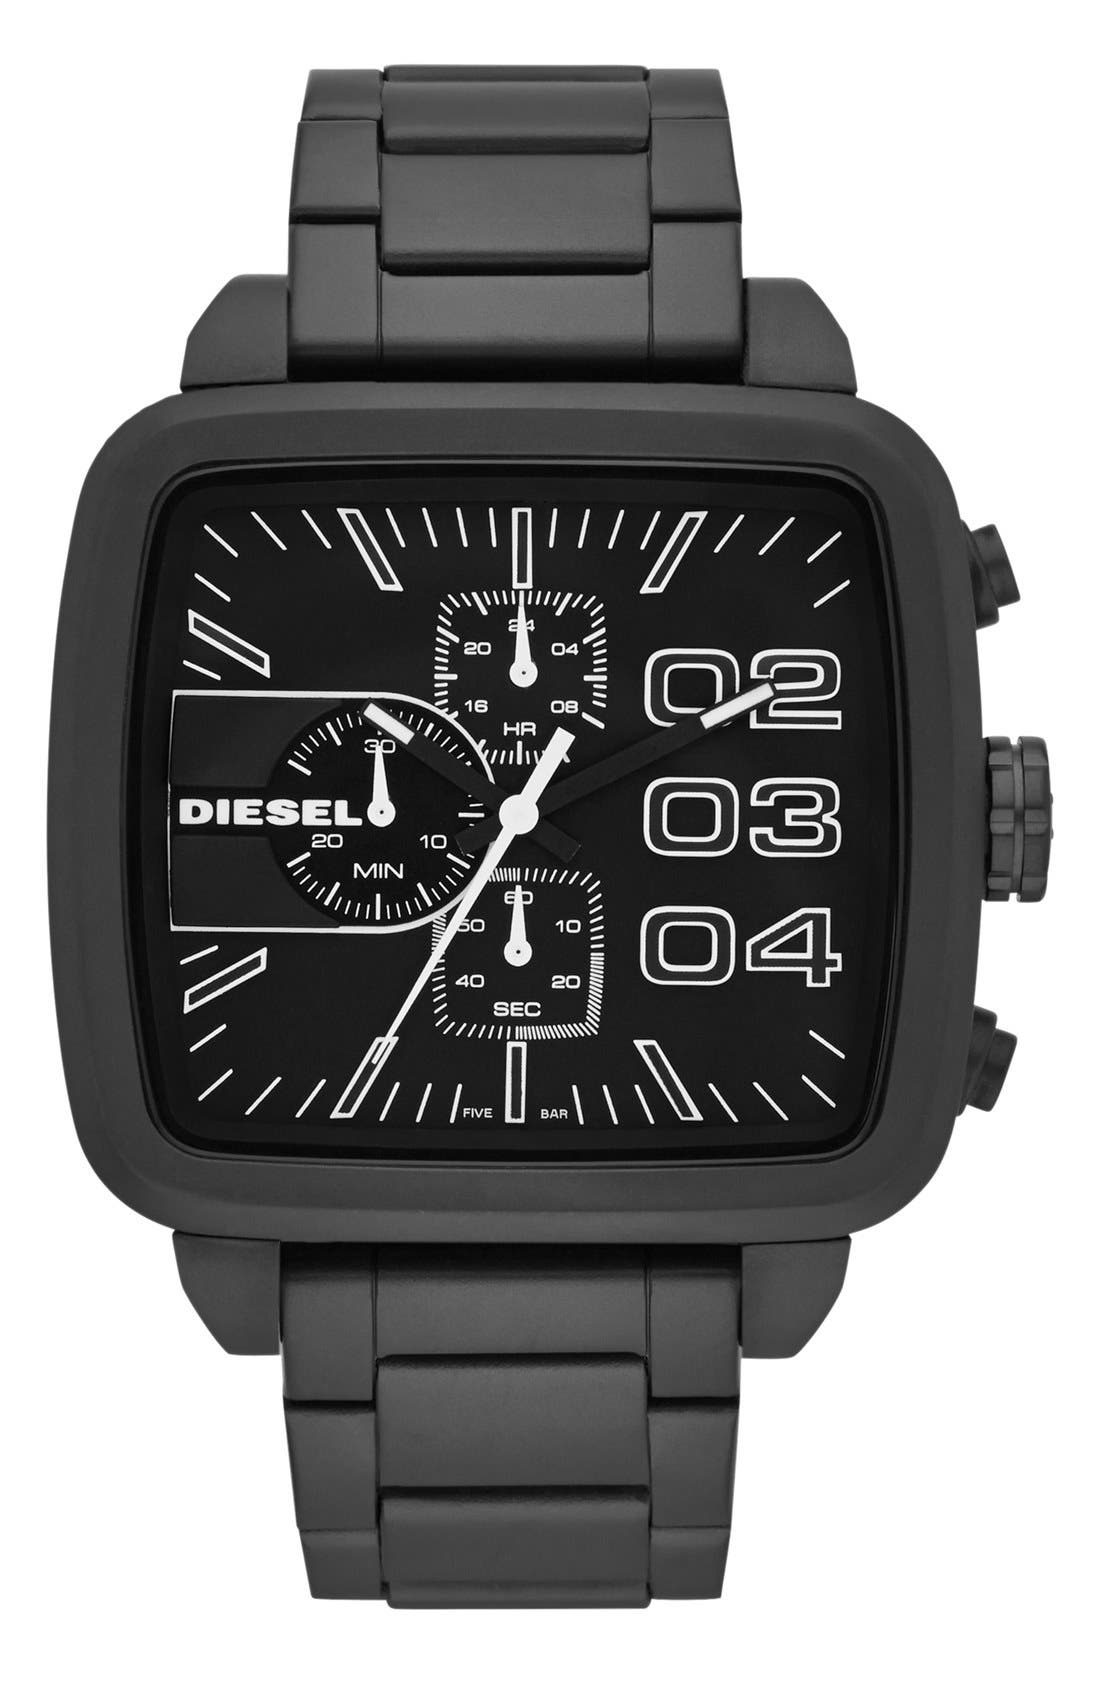 Main Image - DIESEL® 'Square Franchise' Bracelet Watch, 57mm x 48mm